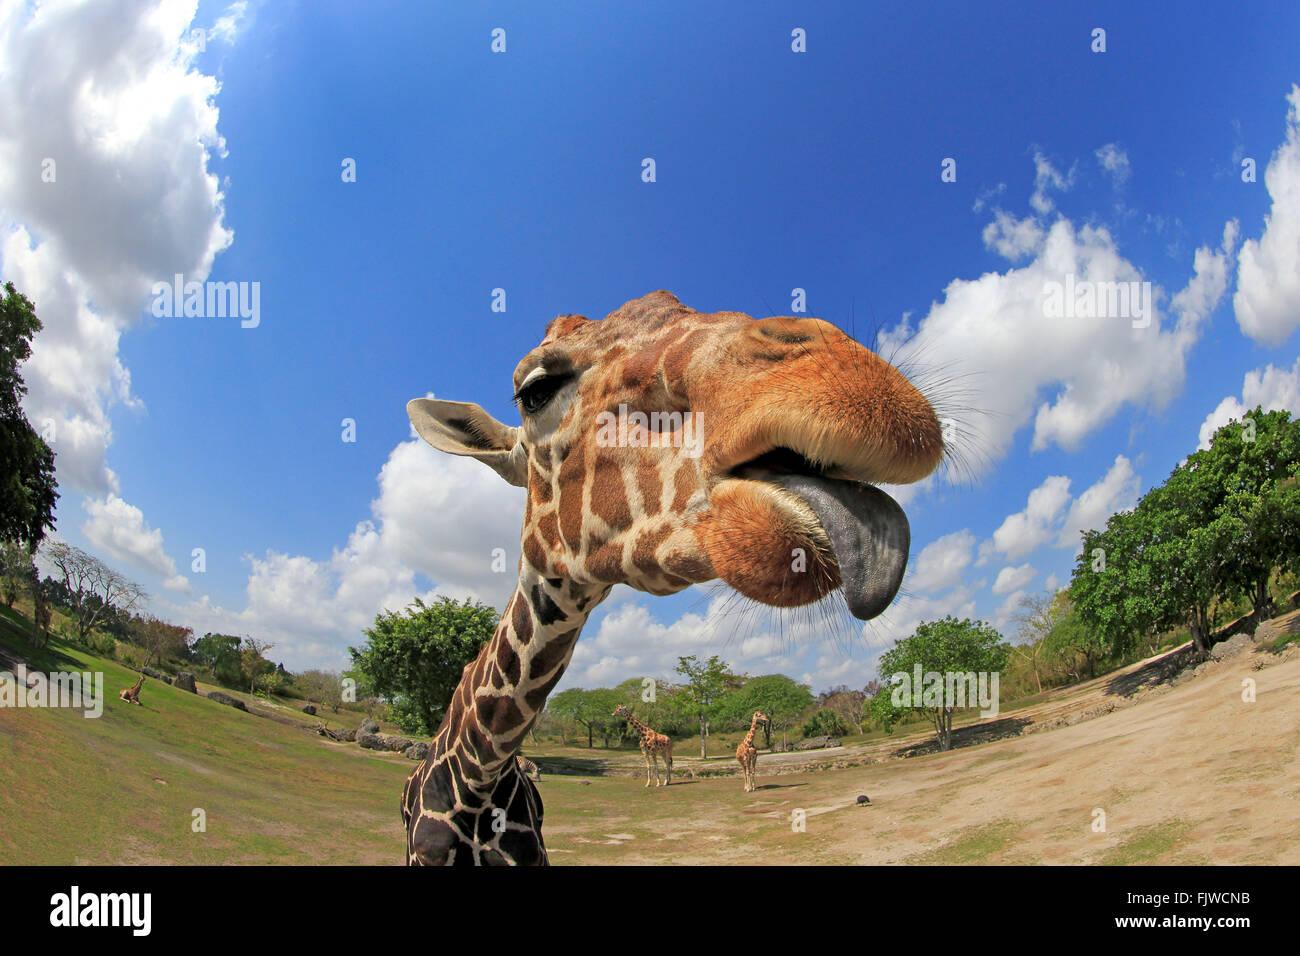 Jirafa reticulada, retrato de adultos, África / (Giraffa camelopardalis reticulata) Foto de stock